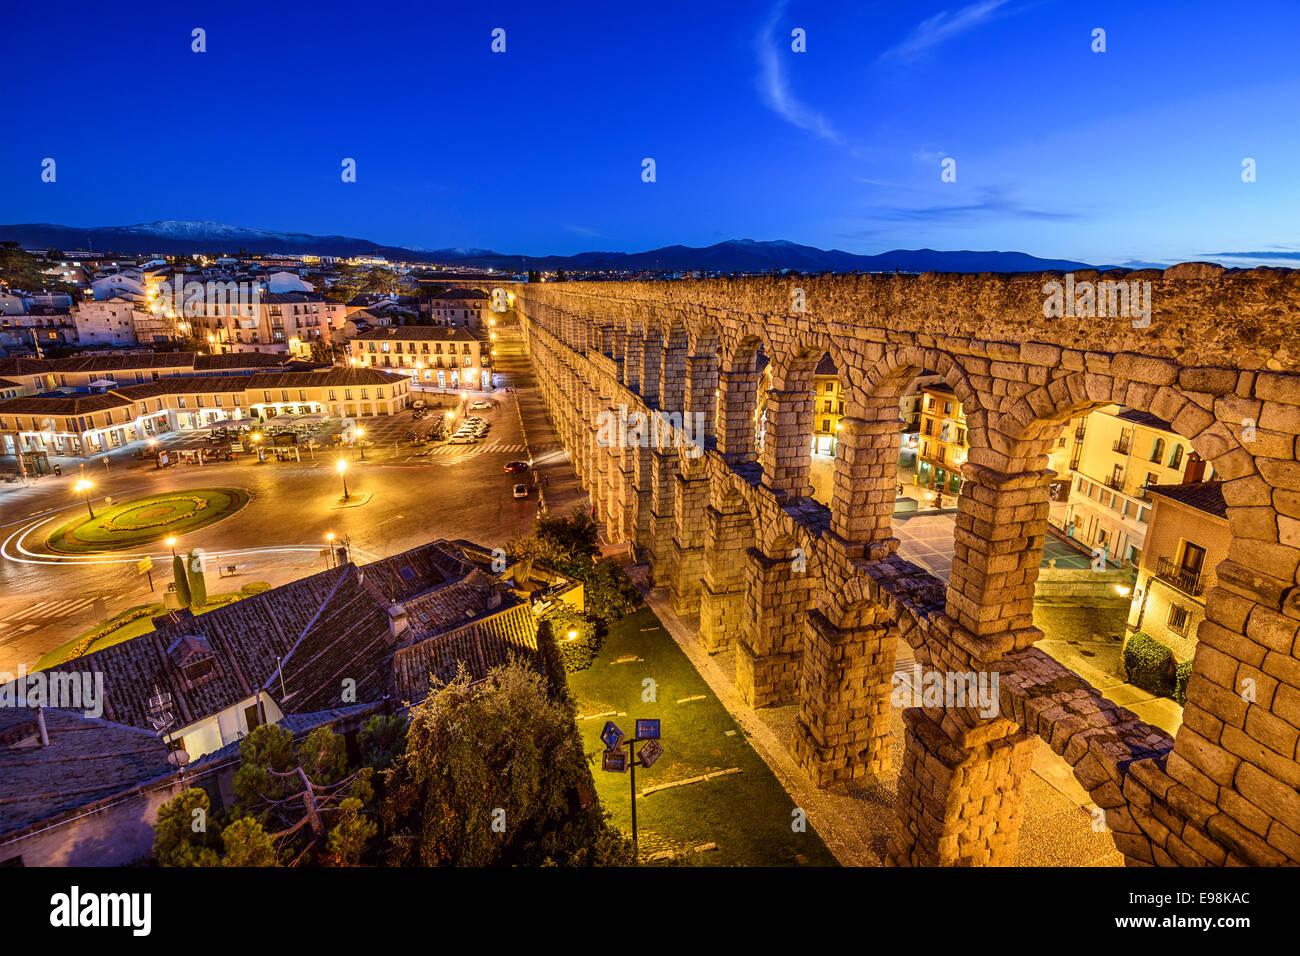 Segovia, Spain at the ancient Roman aqueduct at Plaza del Azoguejo. - Stock Image